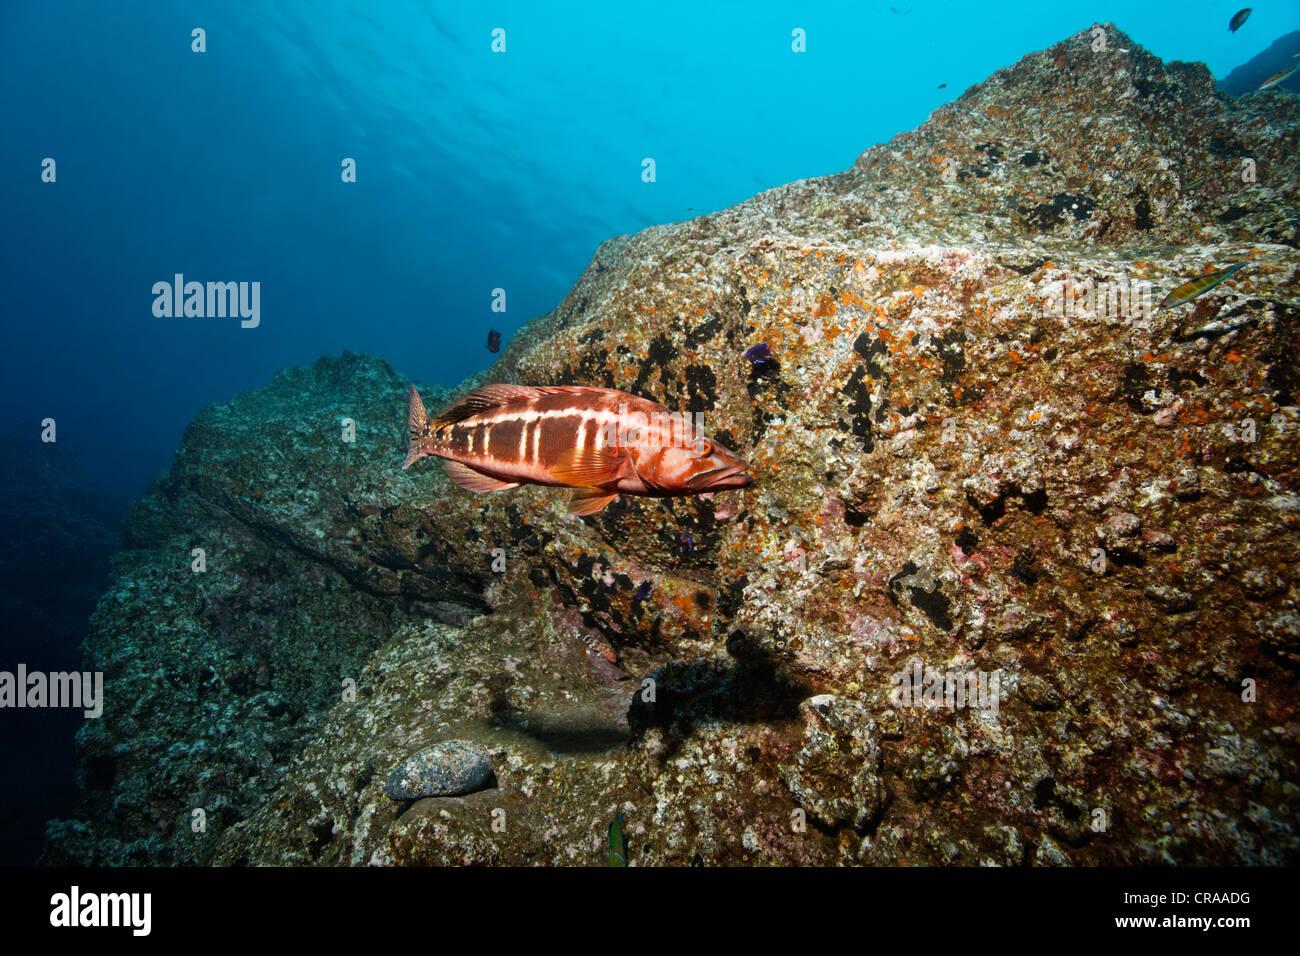 Blacktail Comber (Serranus atricauda), rocky reef, Madeira, Portugal, Europe, Atlantic Ocean - Stock Image